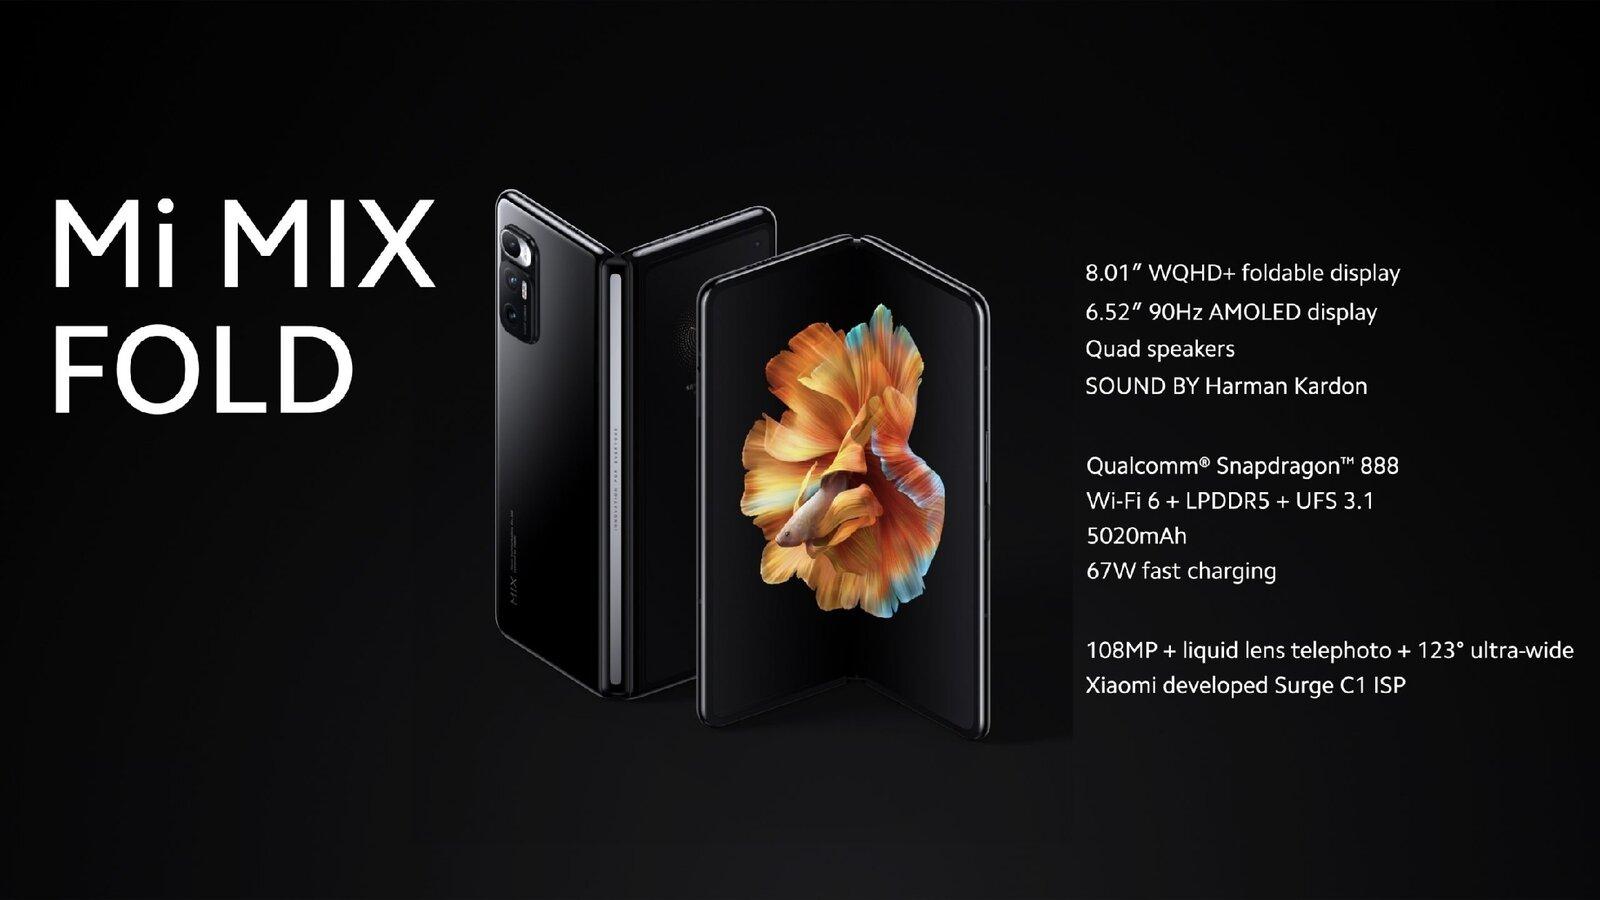 Voici les principales caractéristiques du Xiaomi Mi Mix Fold